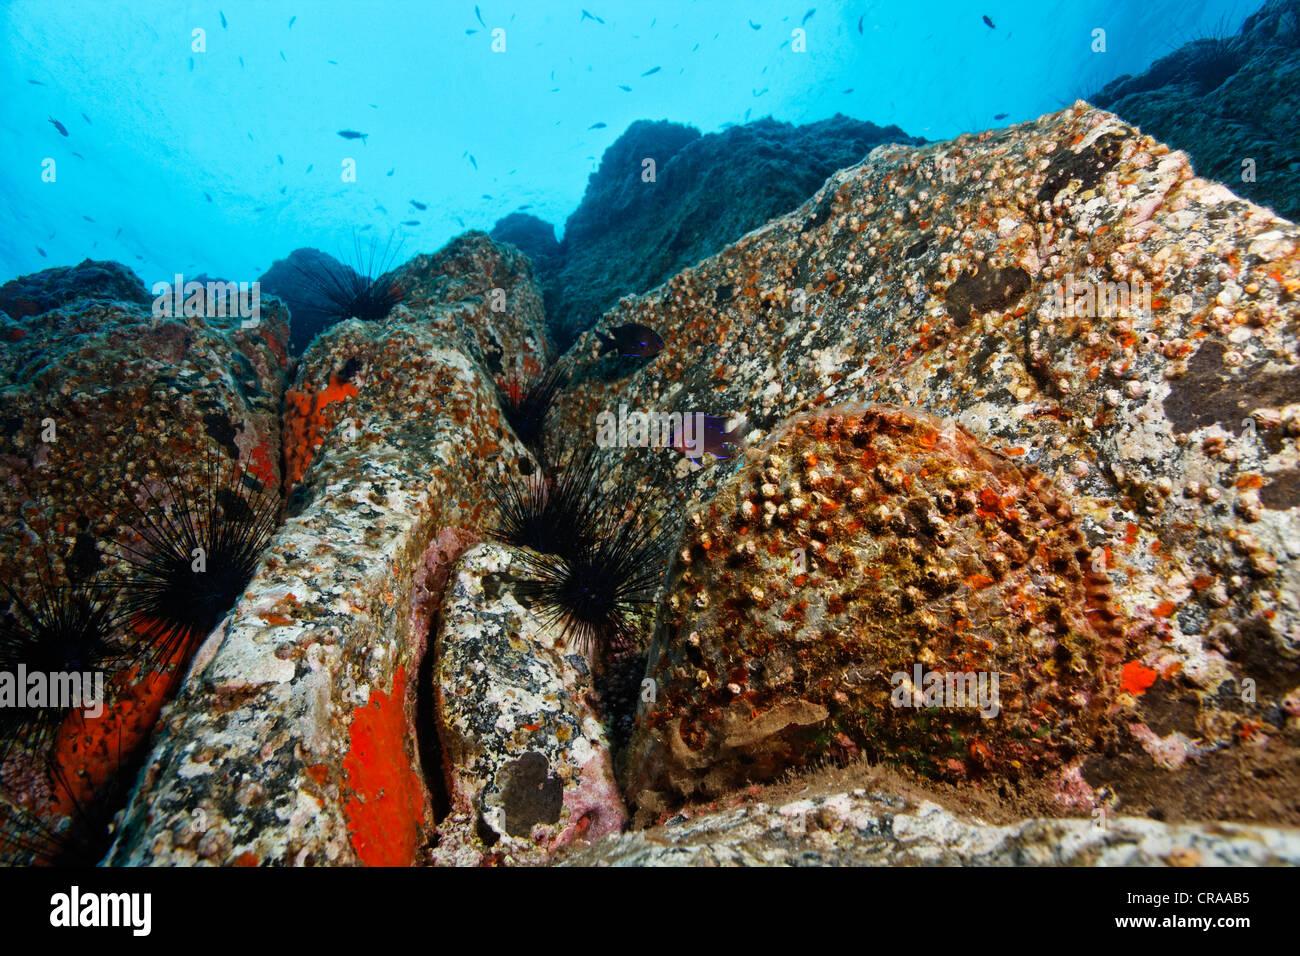 Rough Pen Shell (Pinna rudis), Acorn Barnacles (Balanus trigonus), rocks, rocky crevice, Madeira, Portugal, Europe - Stock Image